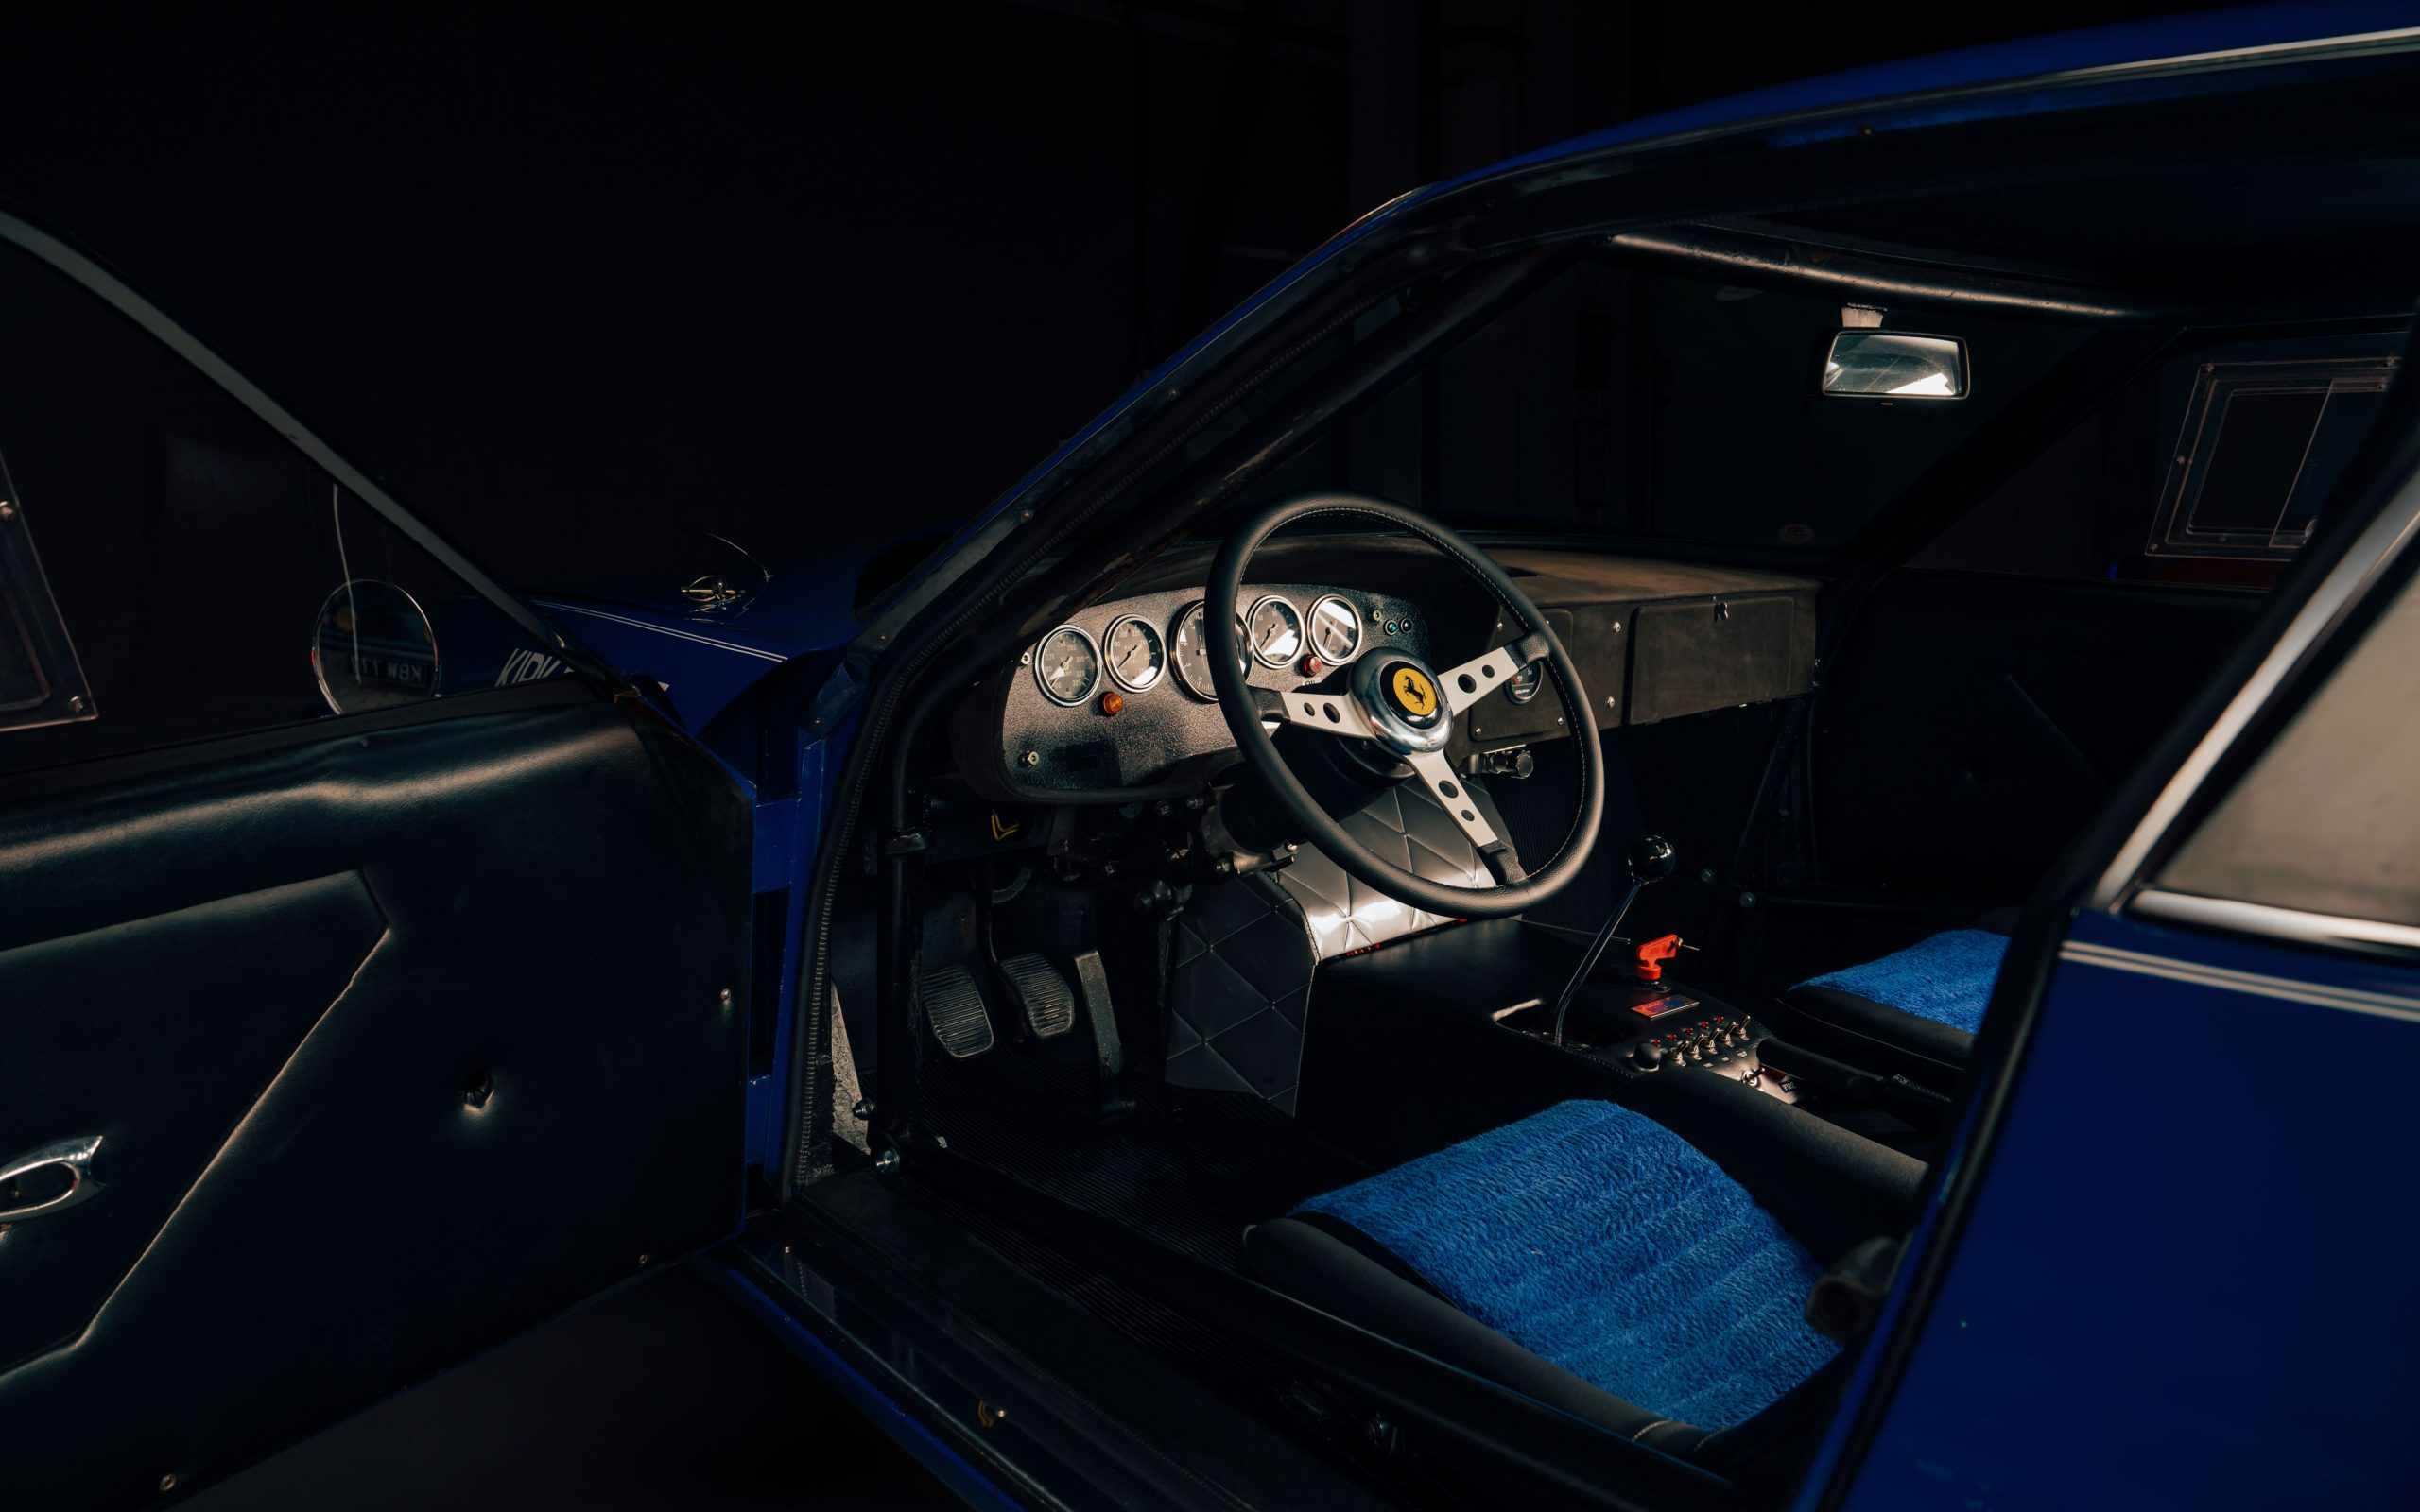 Ferrari 365 GTB:4 Daytona interior cockpit